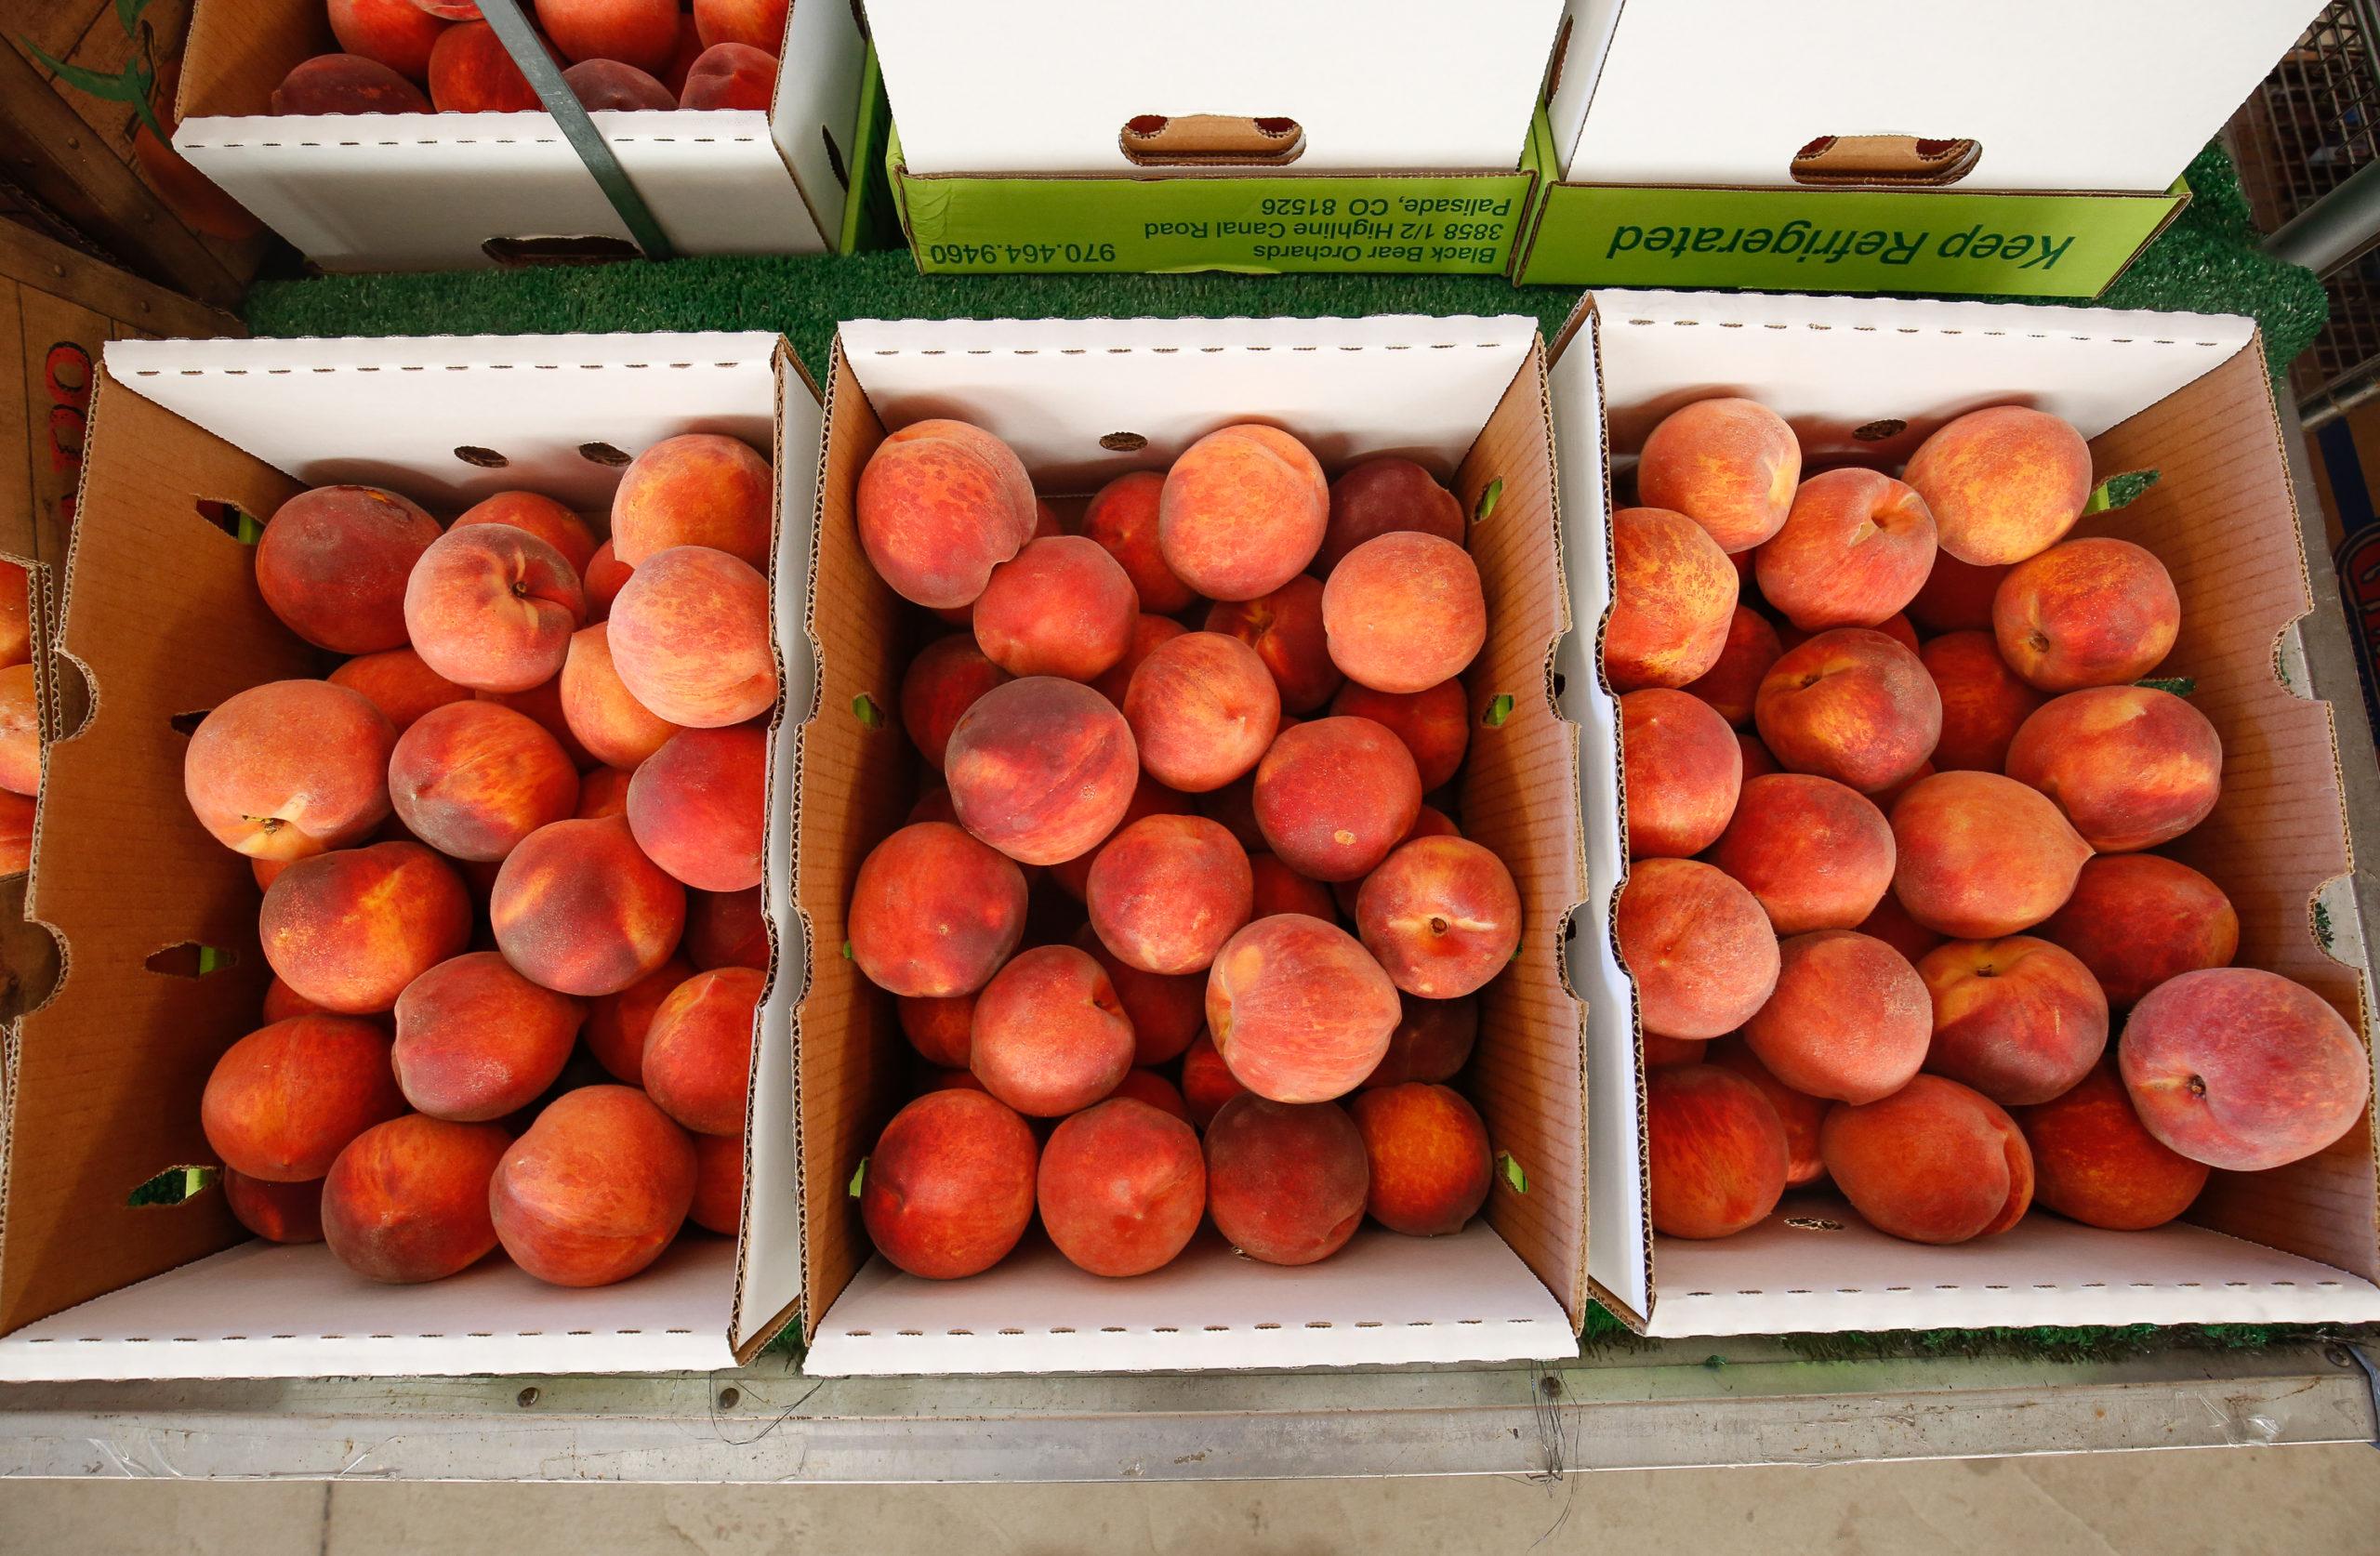 Palisade peaches